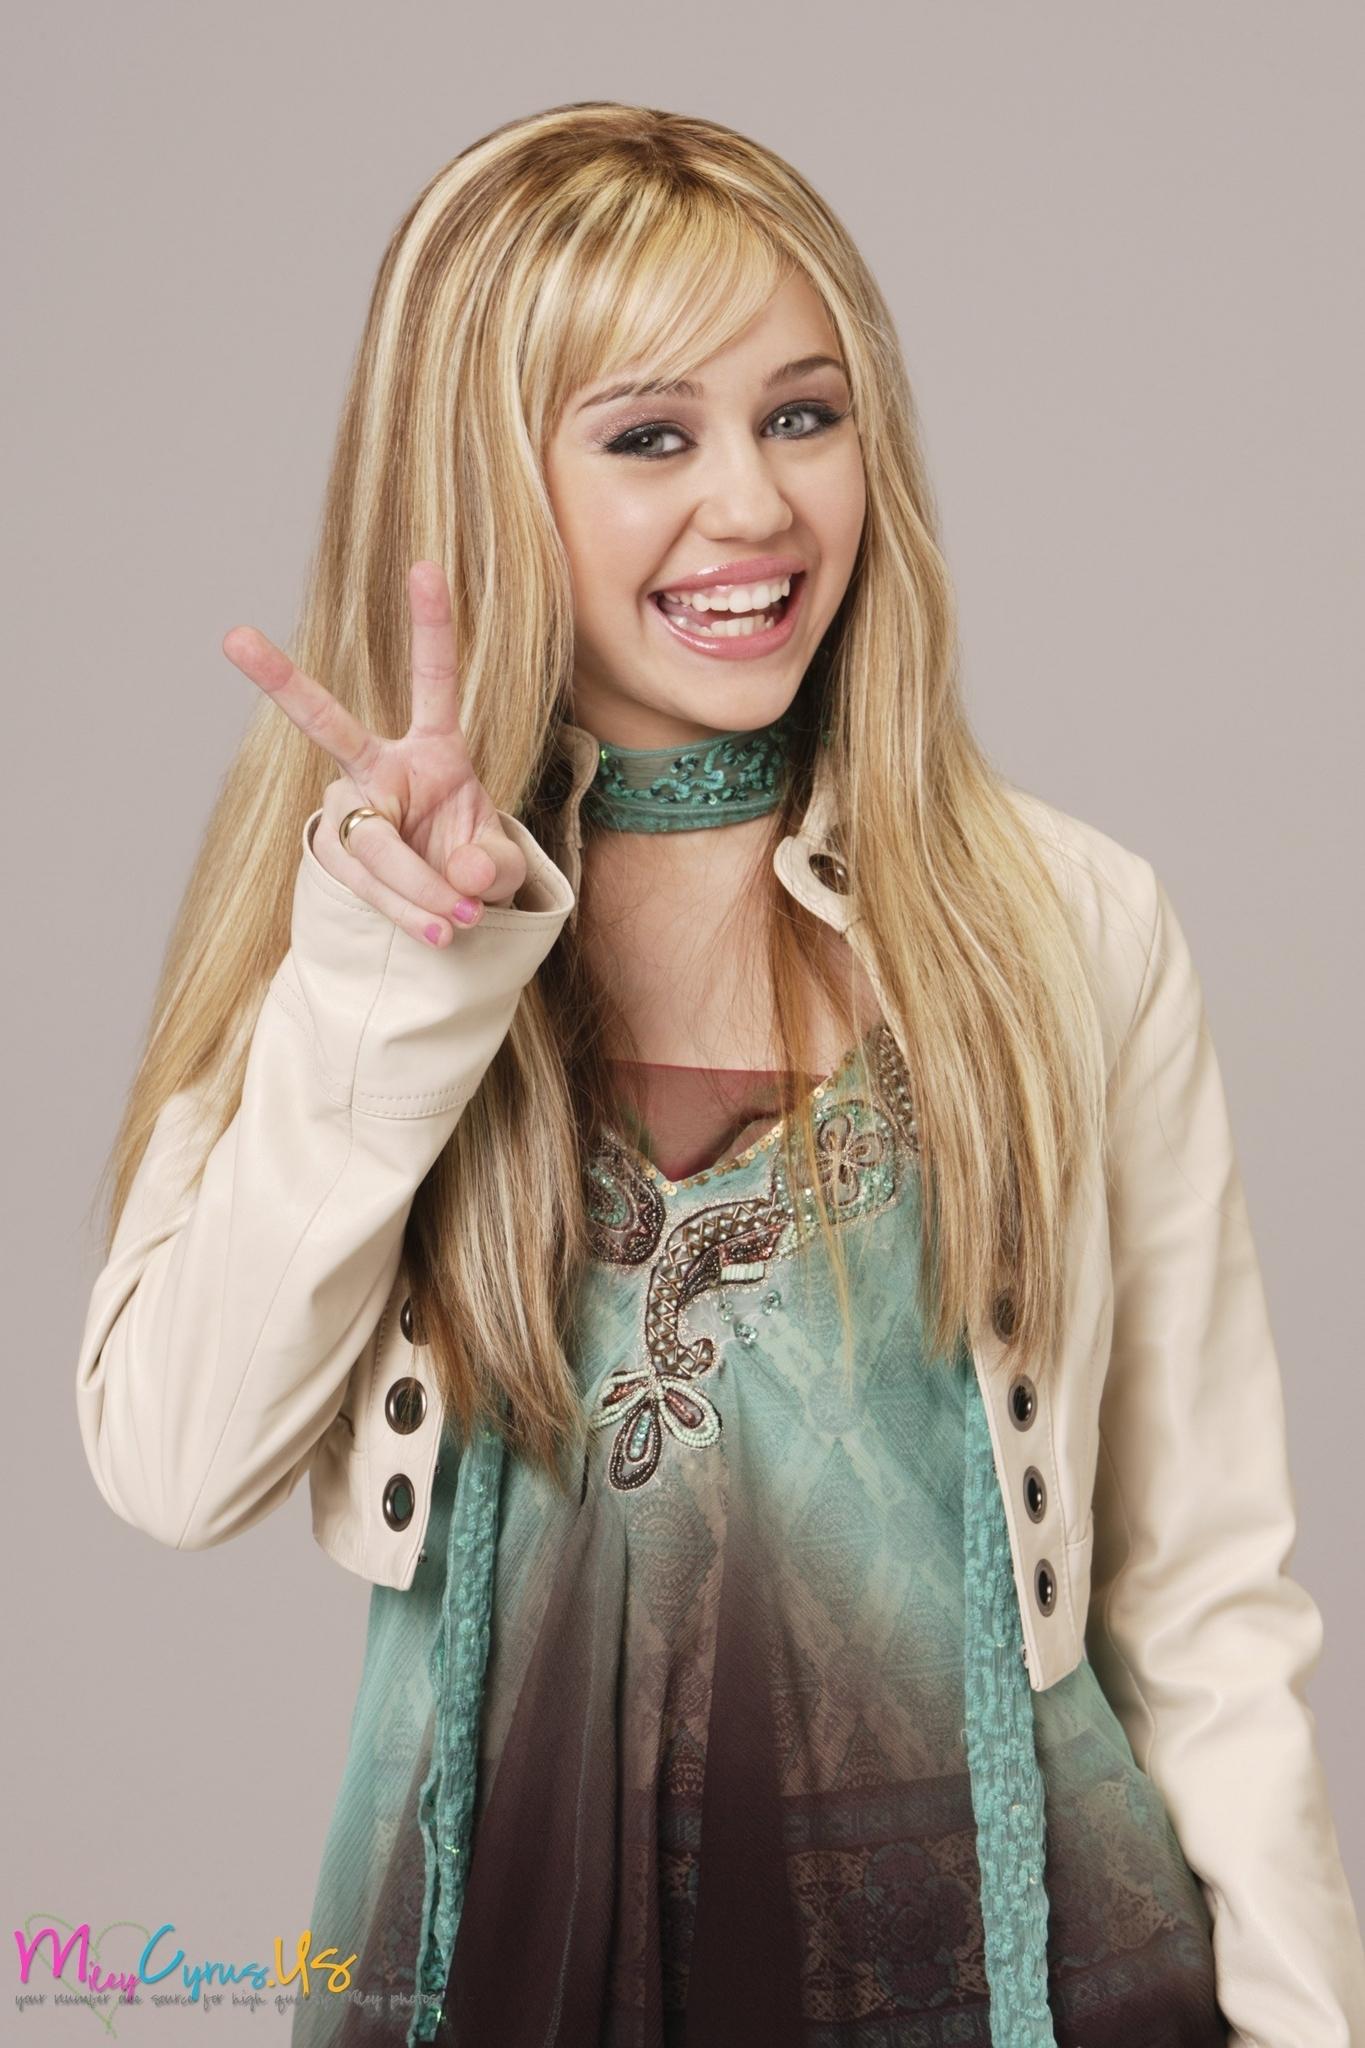 Miley Cyrus Images Hannah Montana Season 1 Promotional Photos Hq